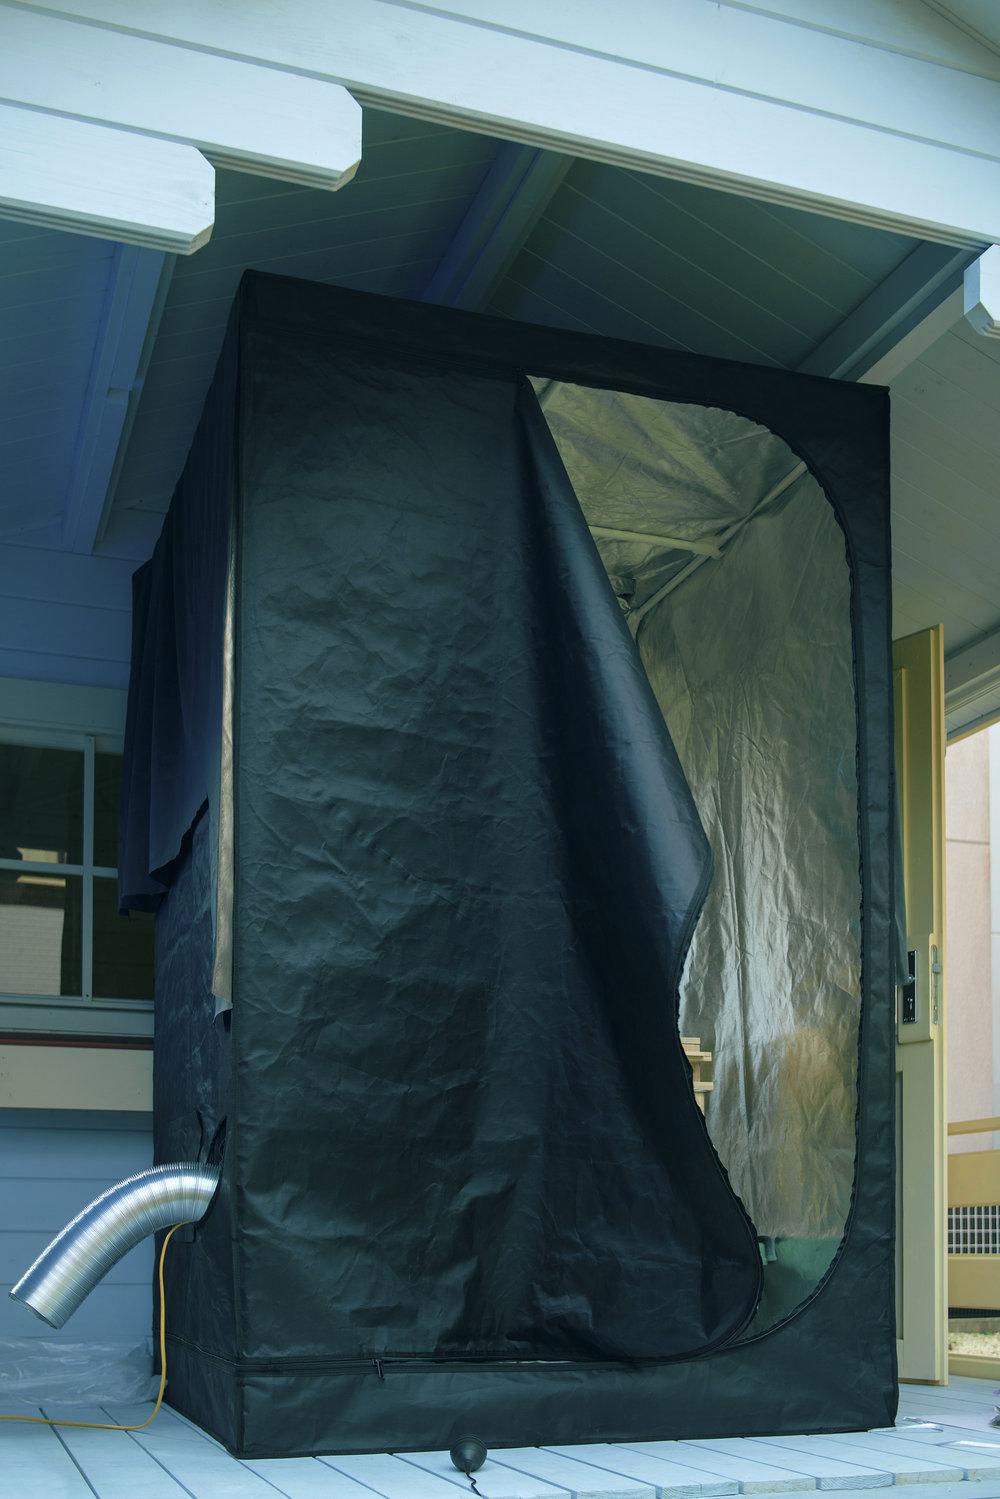 Special darkroom for daguerreotype process.  ダゲレオタイプ用の移動可能な特別暗室  다게레오 타입용의 이동 가능한 특별 암실